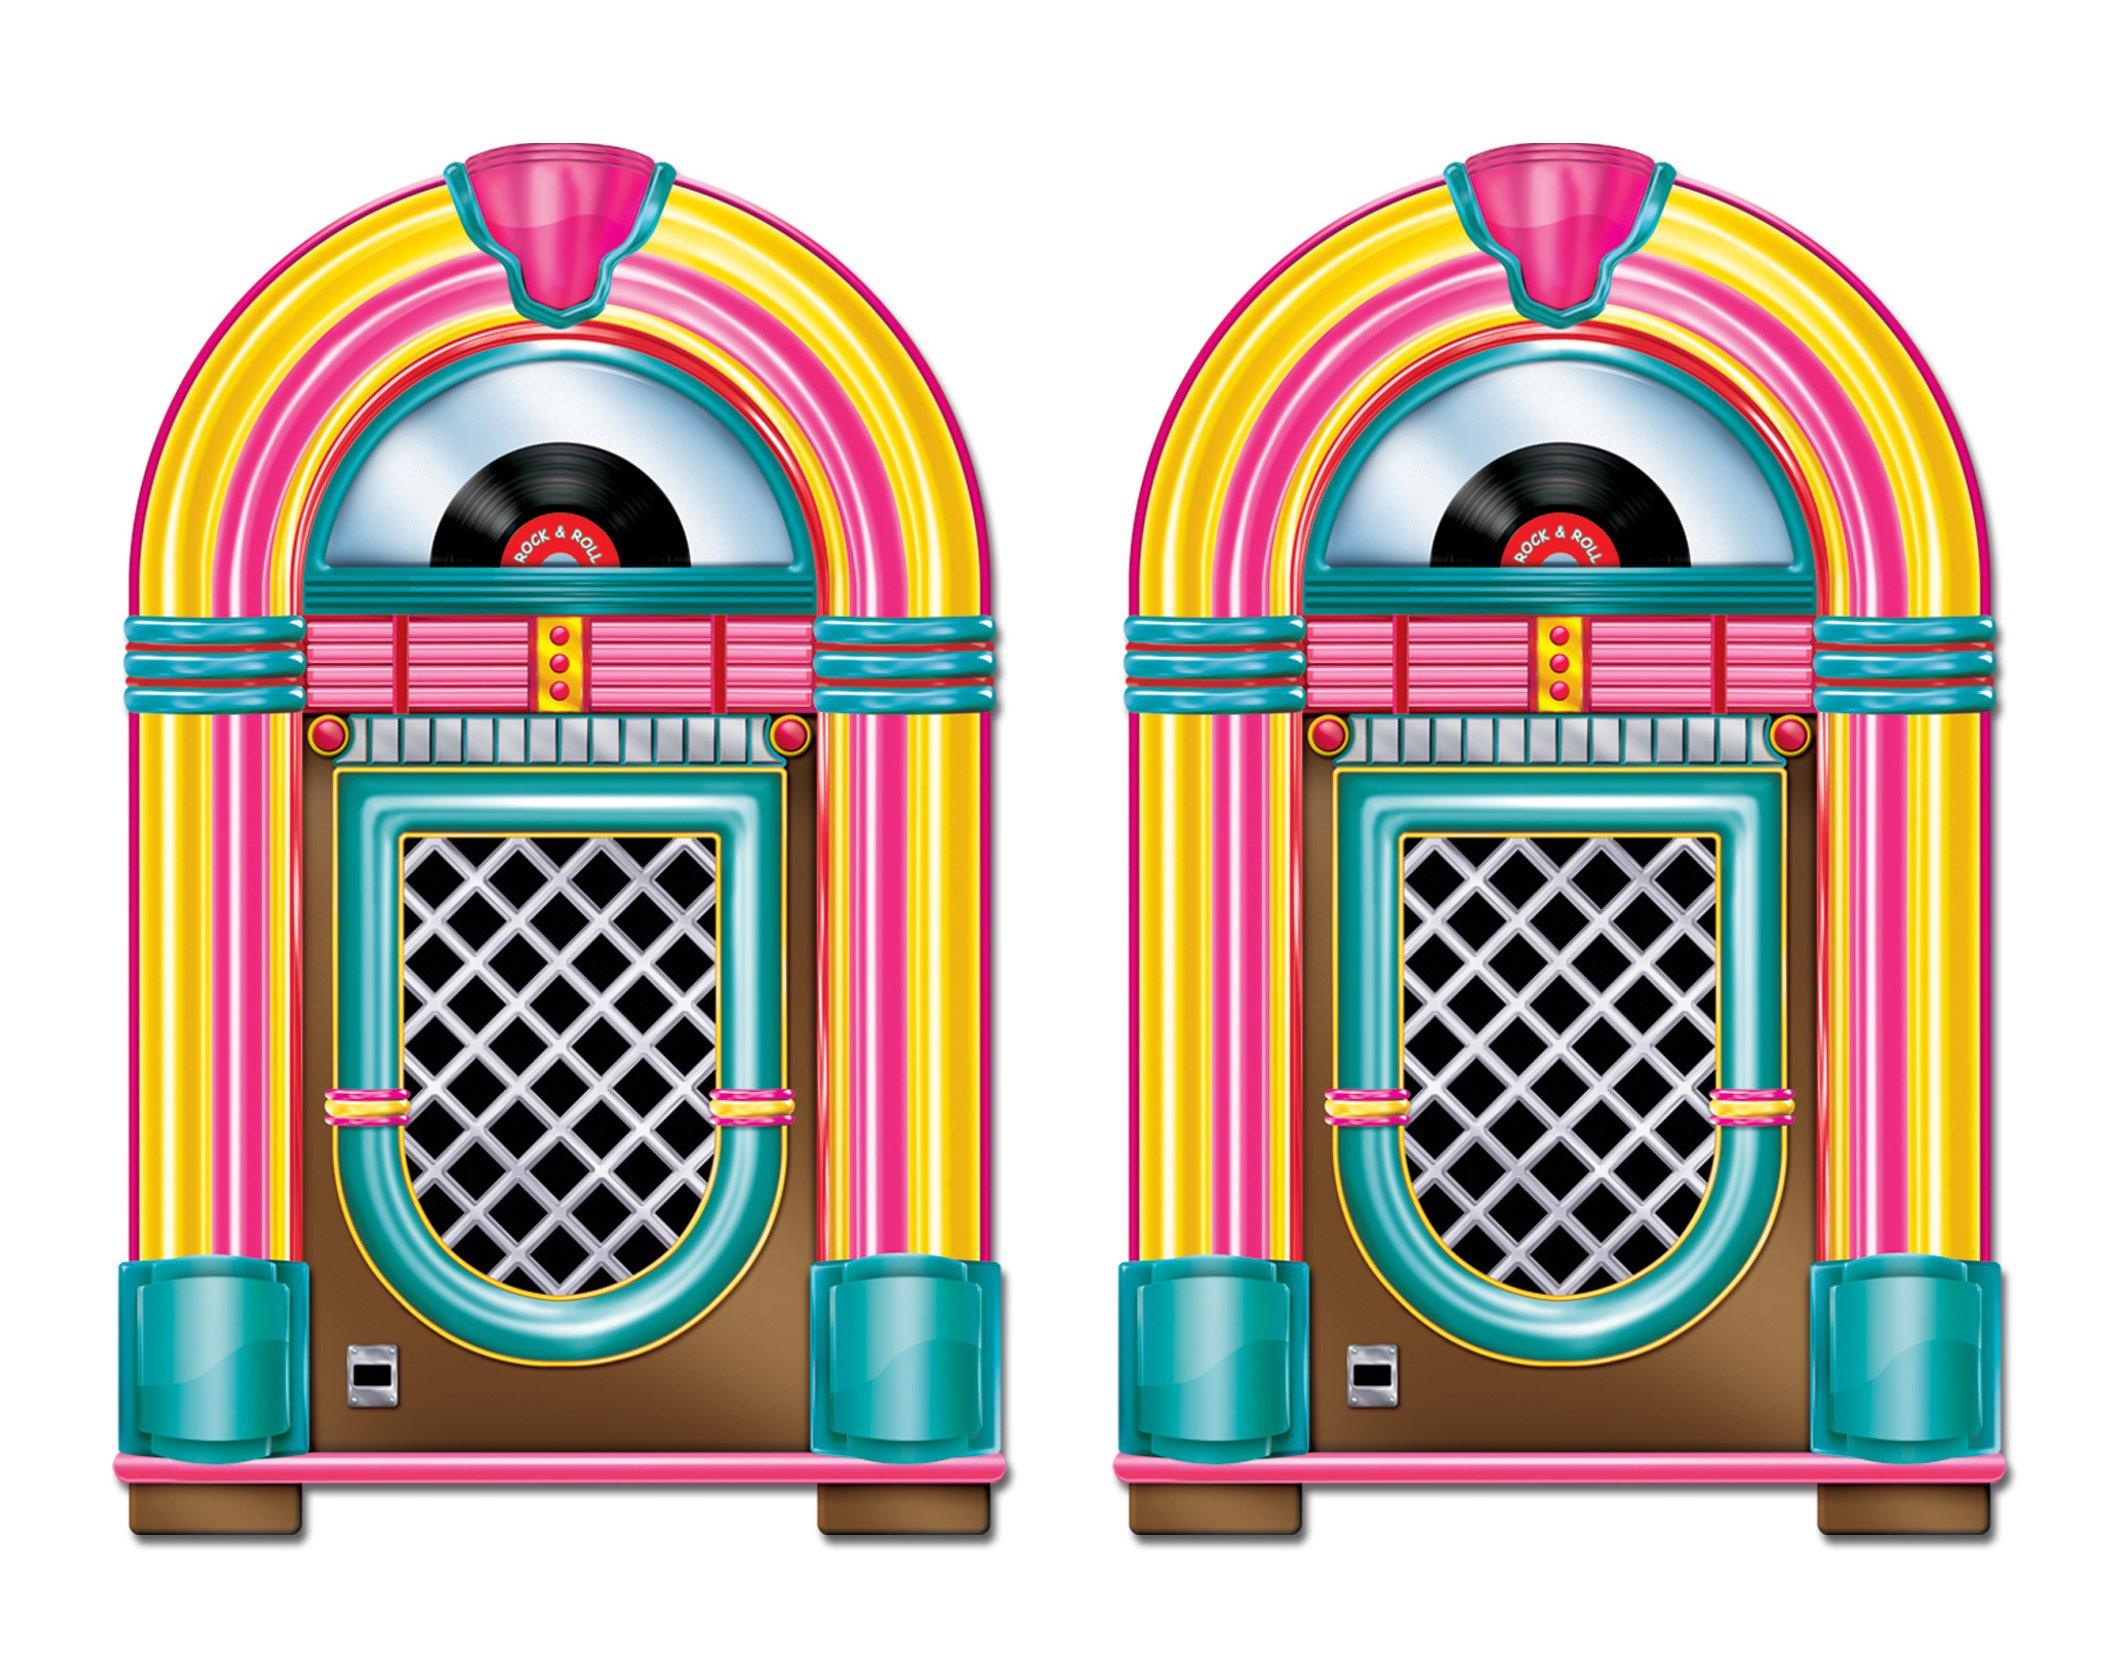 Beistle S57463AZ2, 2 Piece Jukebox Cutouts, 3' by Beistle